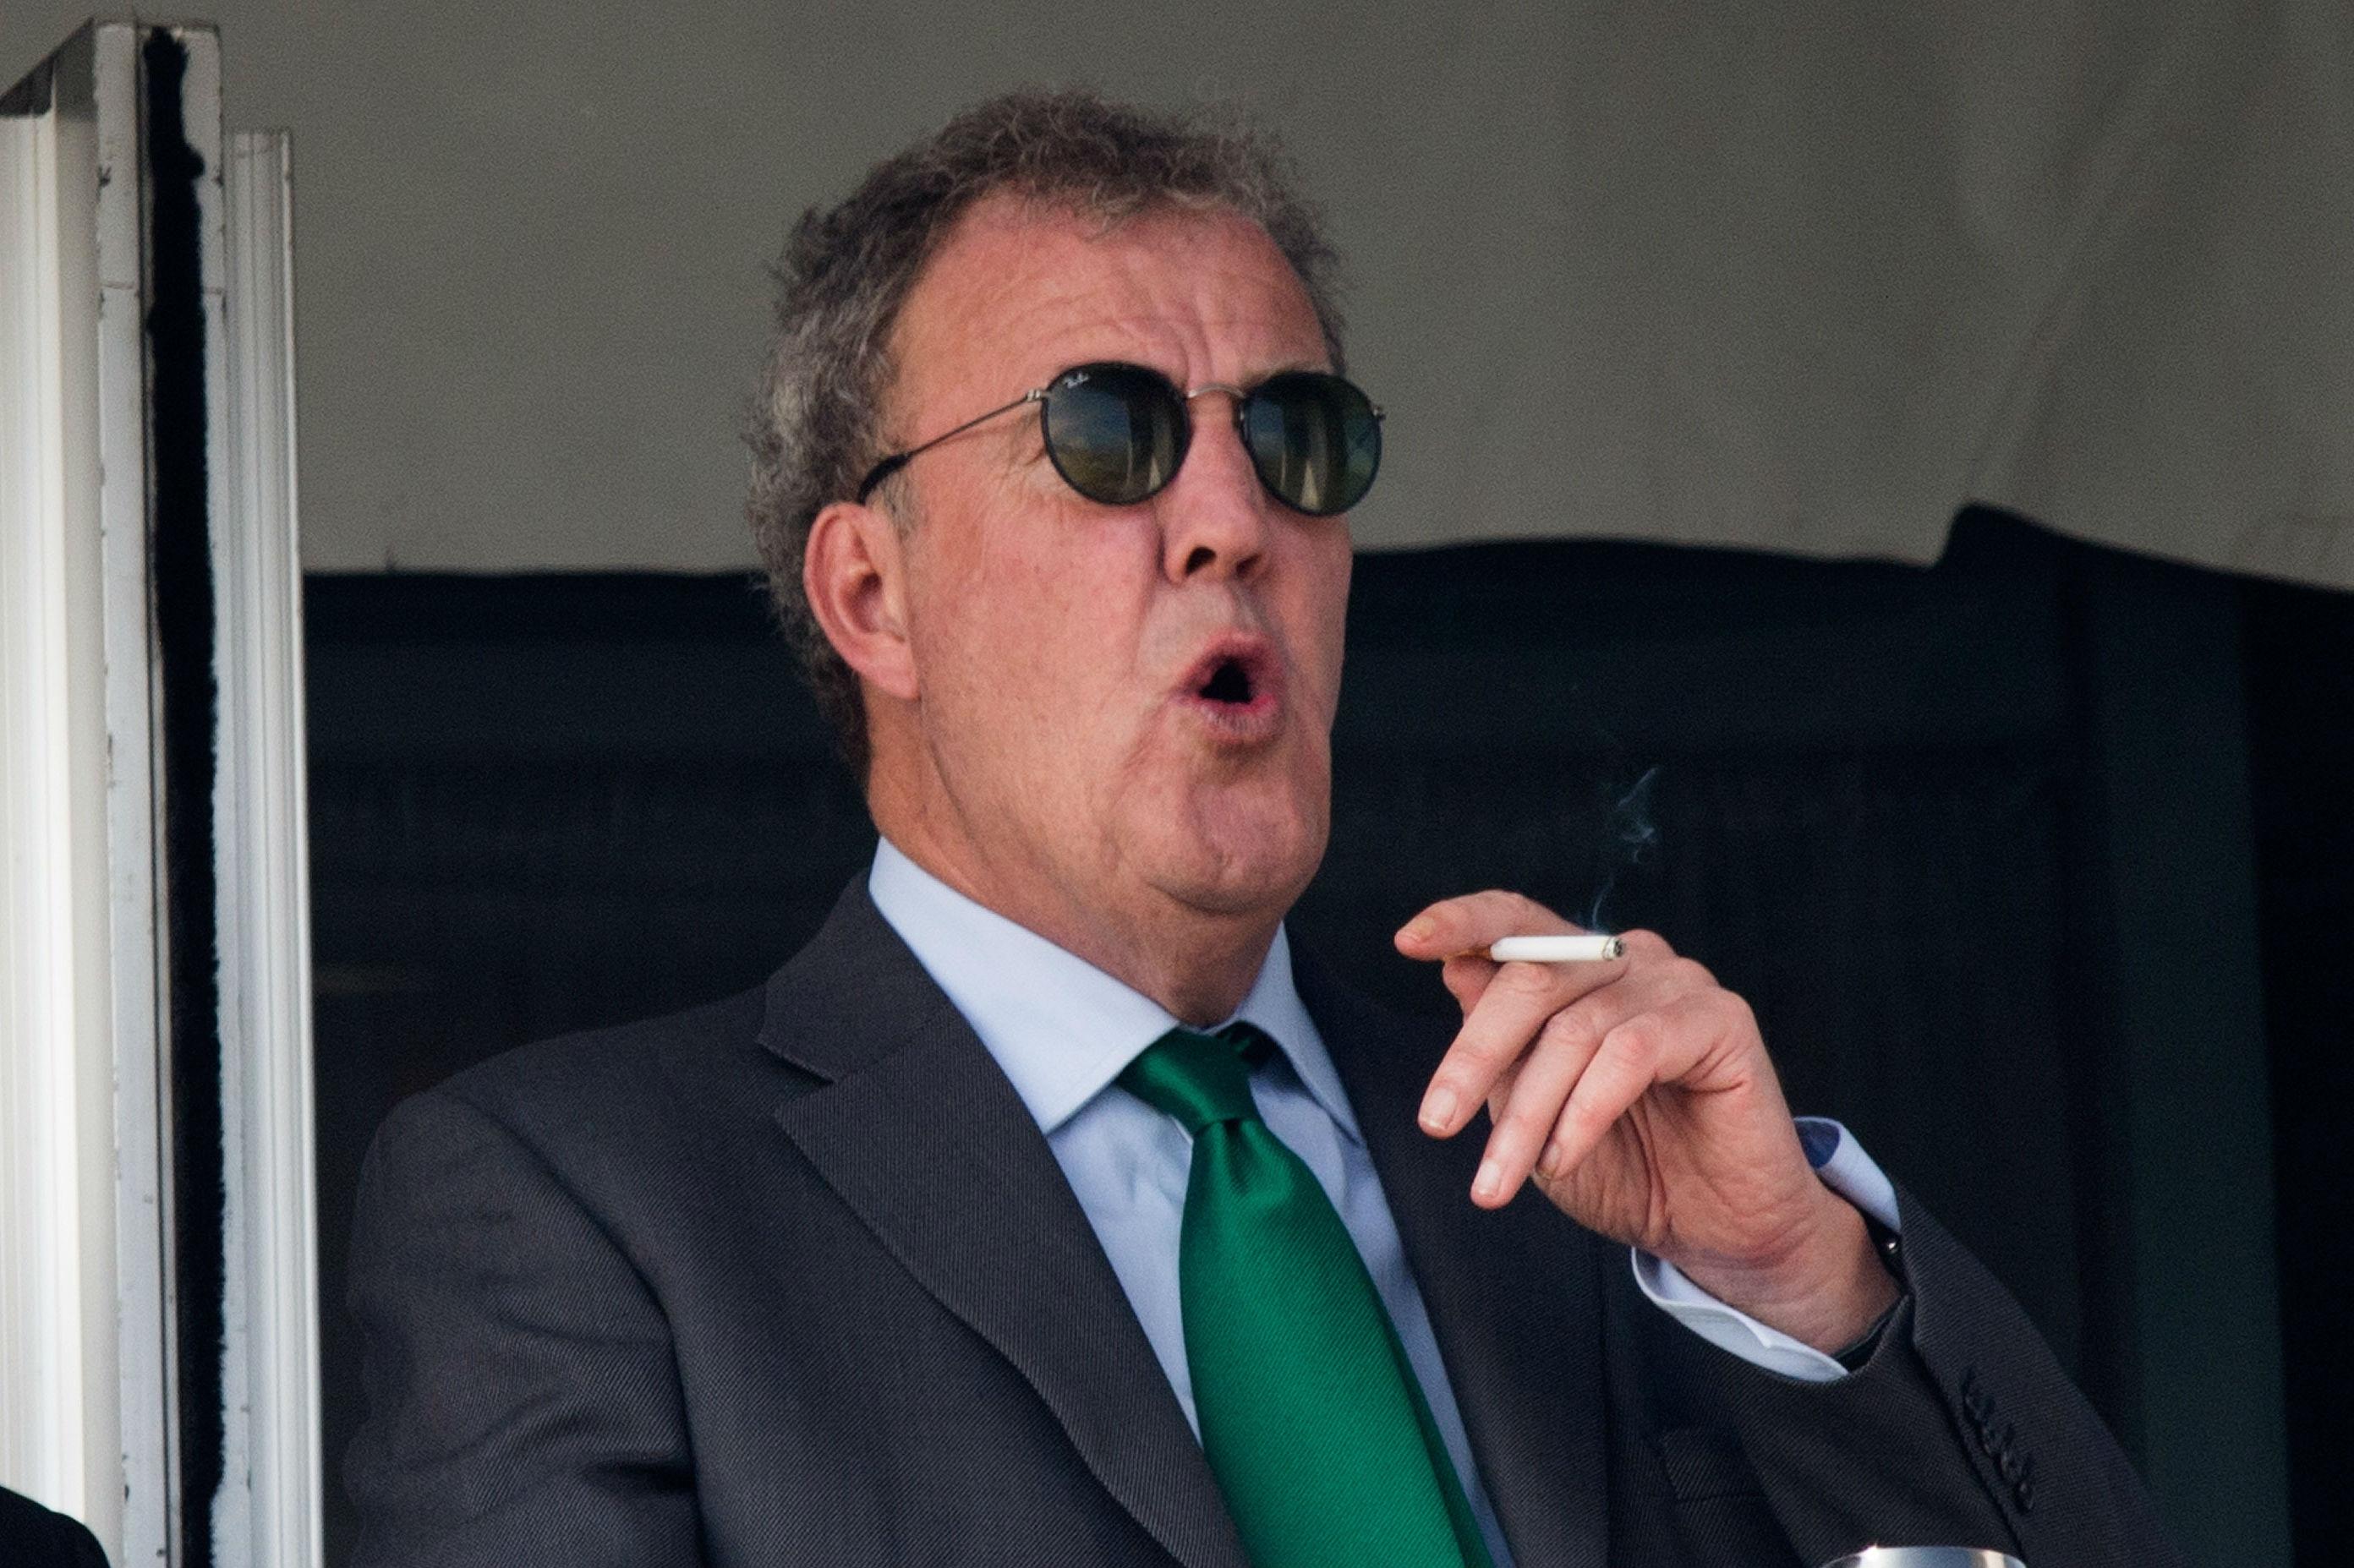 Jeremy Clarkson Images